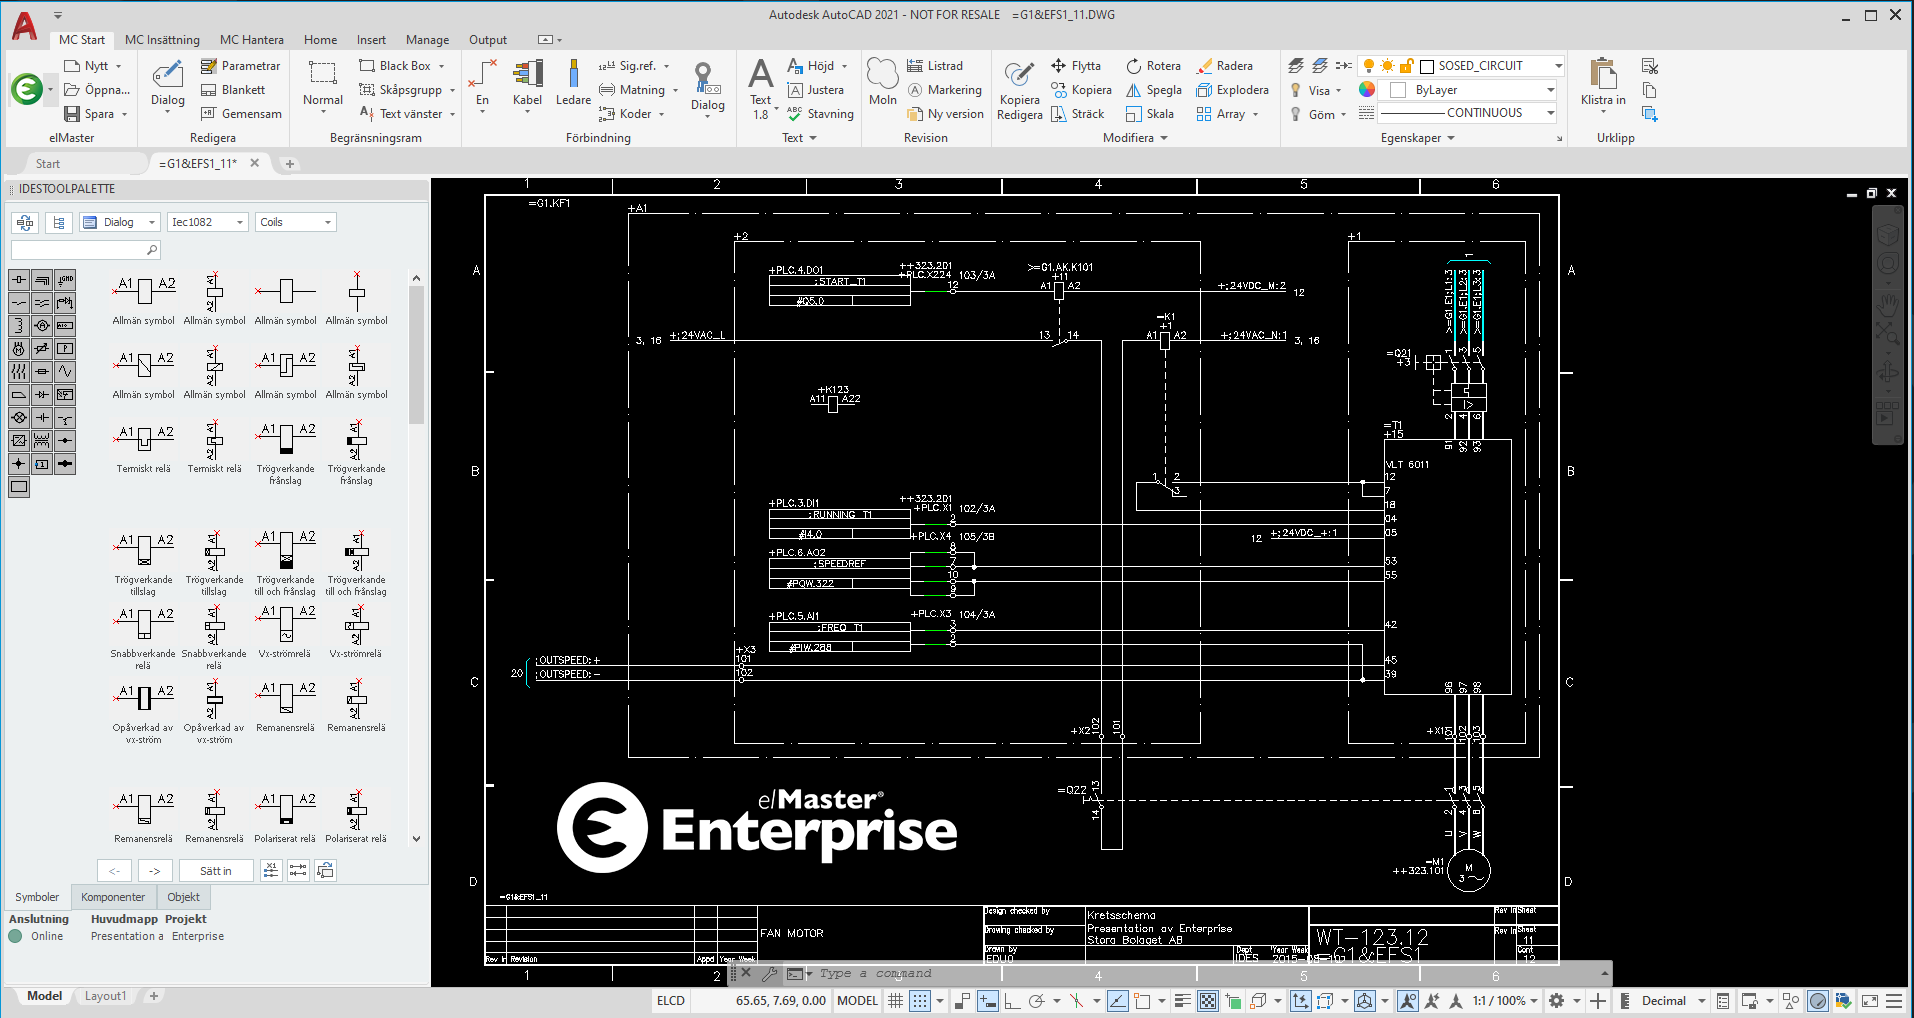 elMaster design enterprise 2021